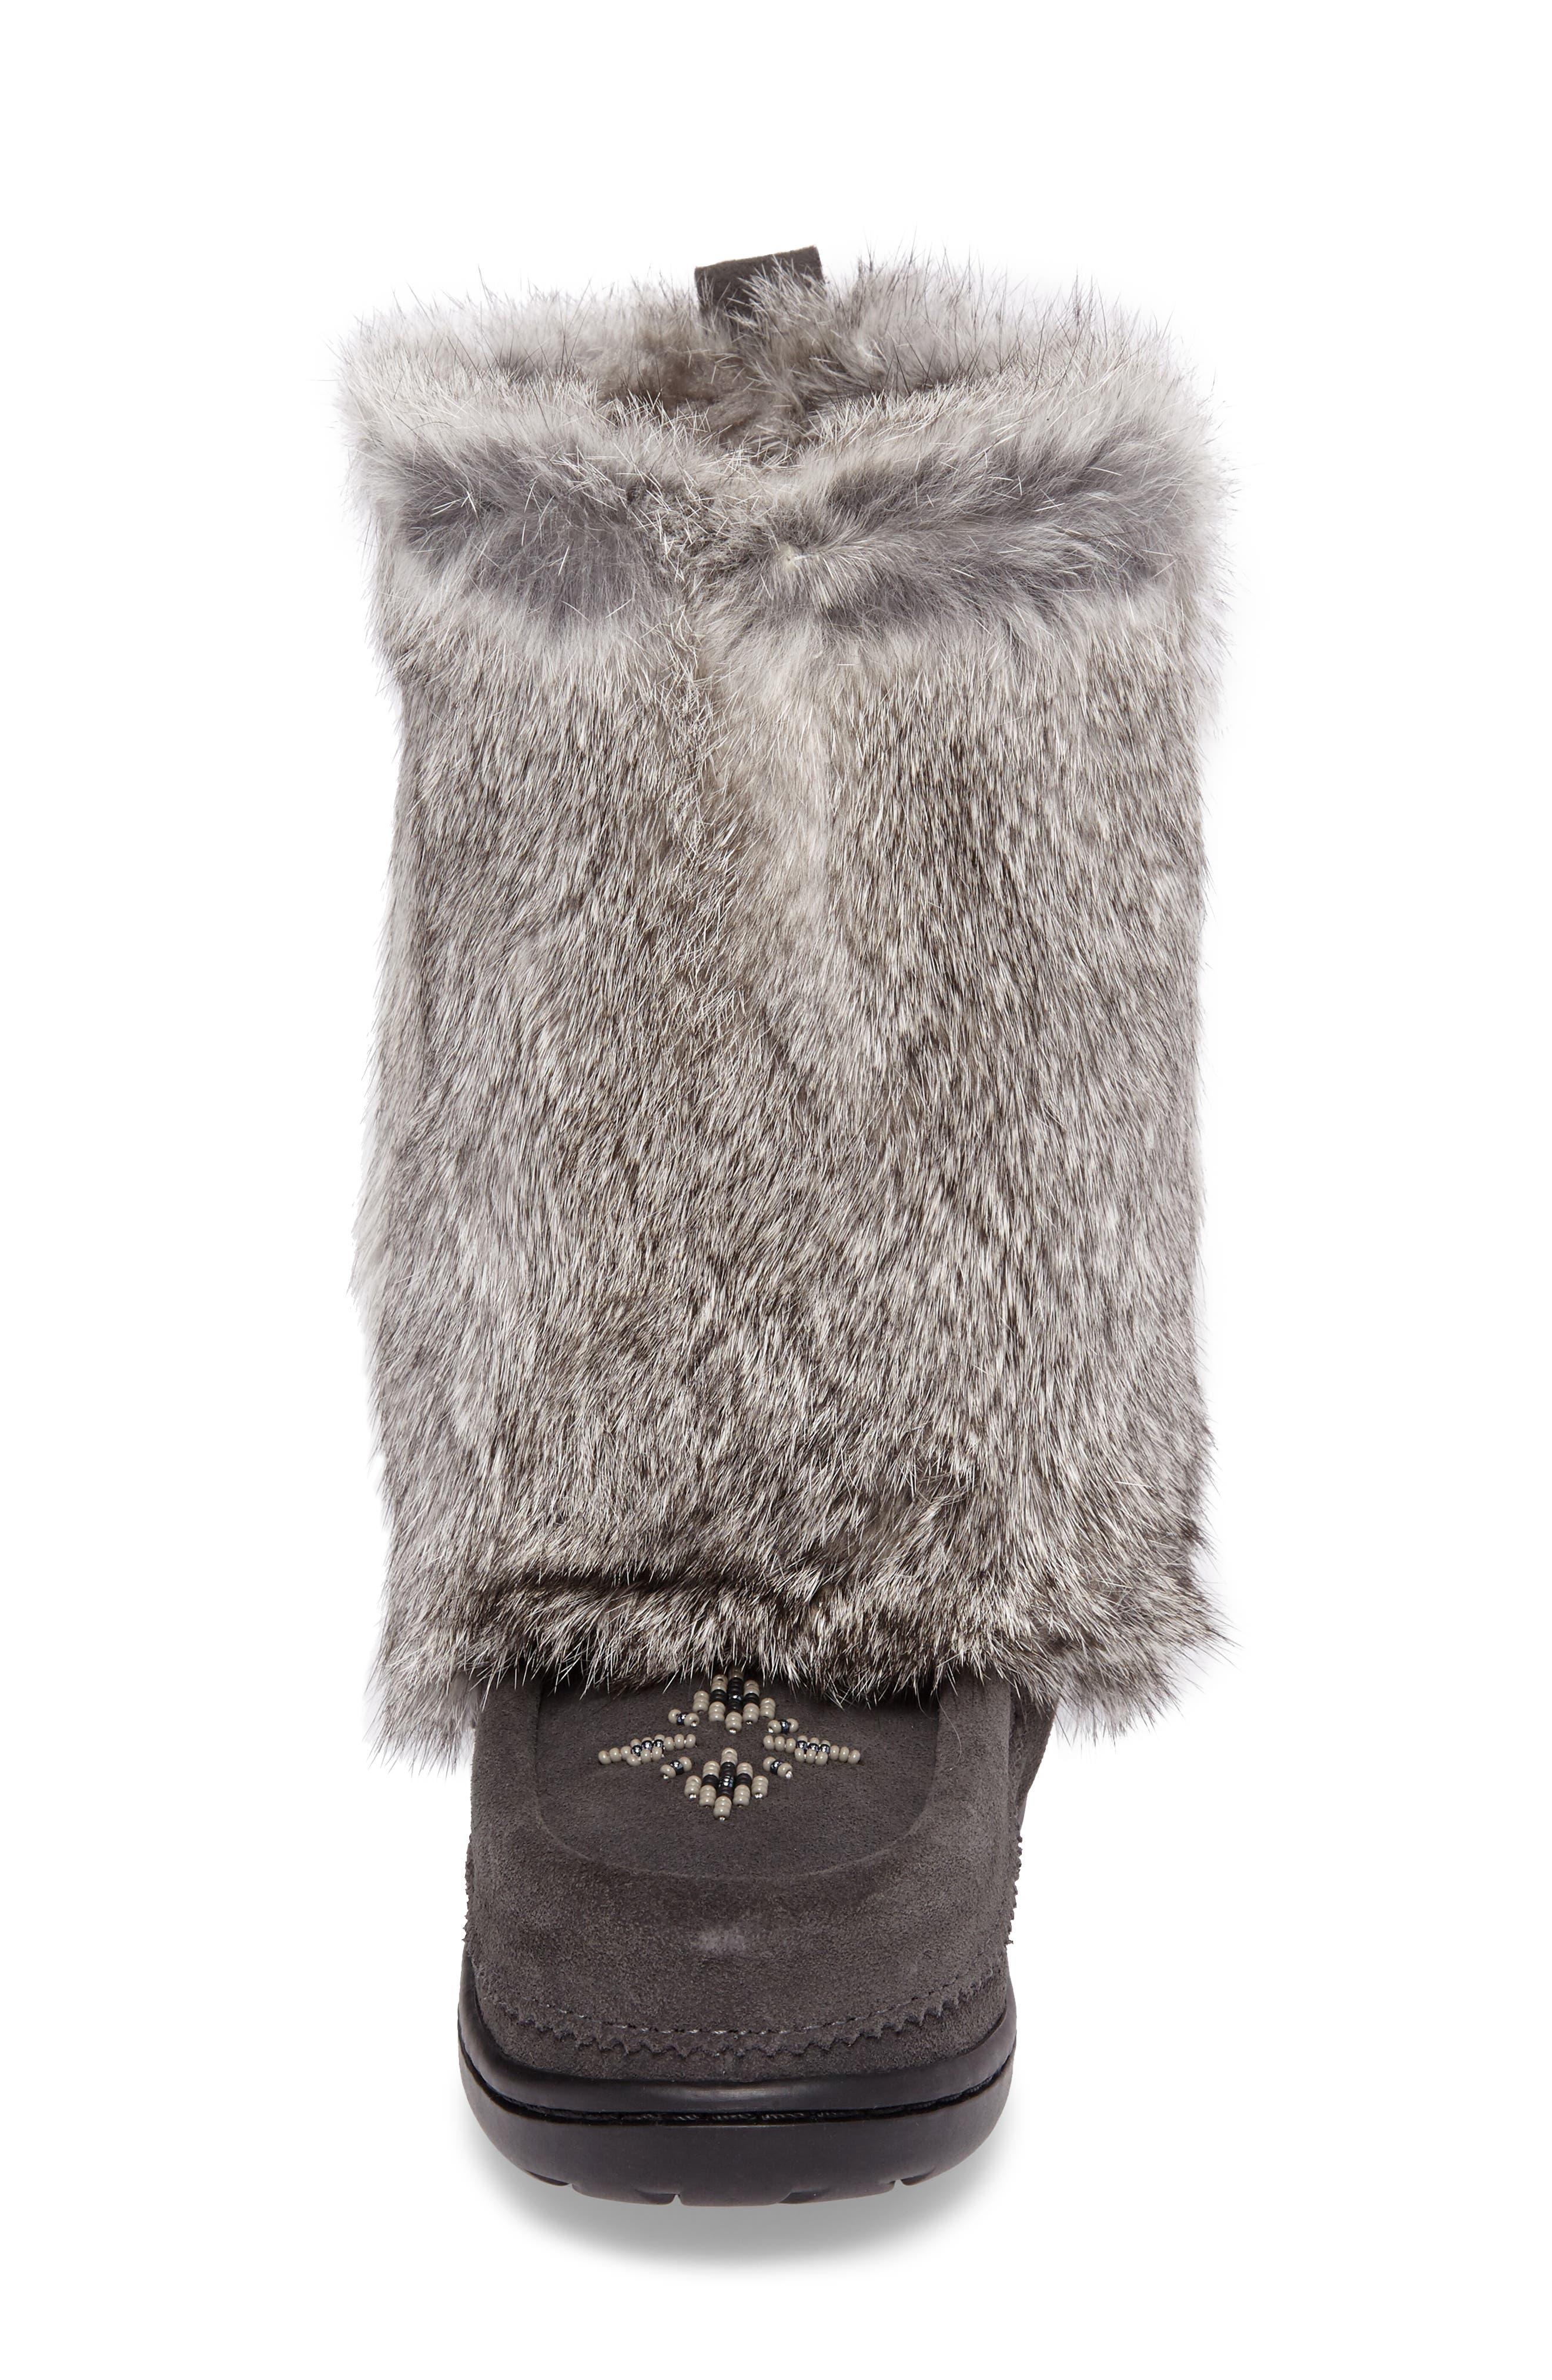 Nordic Genuine Rabbit Fur & Genuine Shearling Mukluk Boot,                             Alternate thumbnail 4, color,                             Charcoal